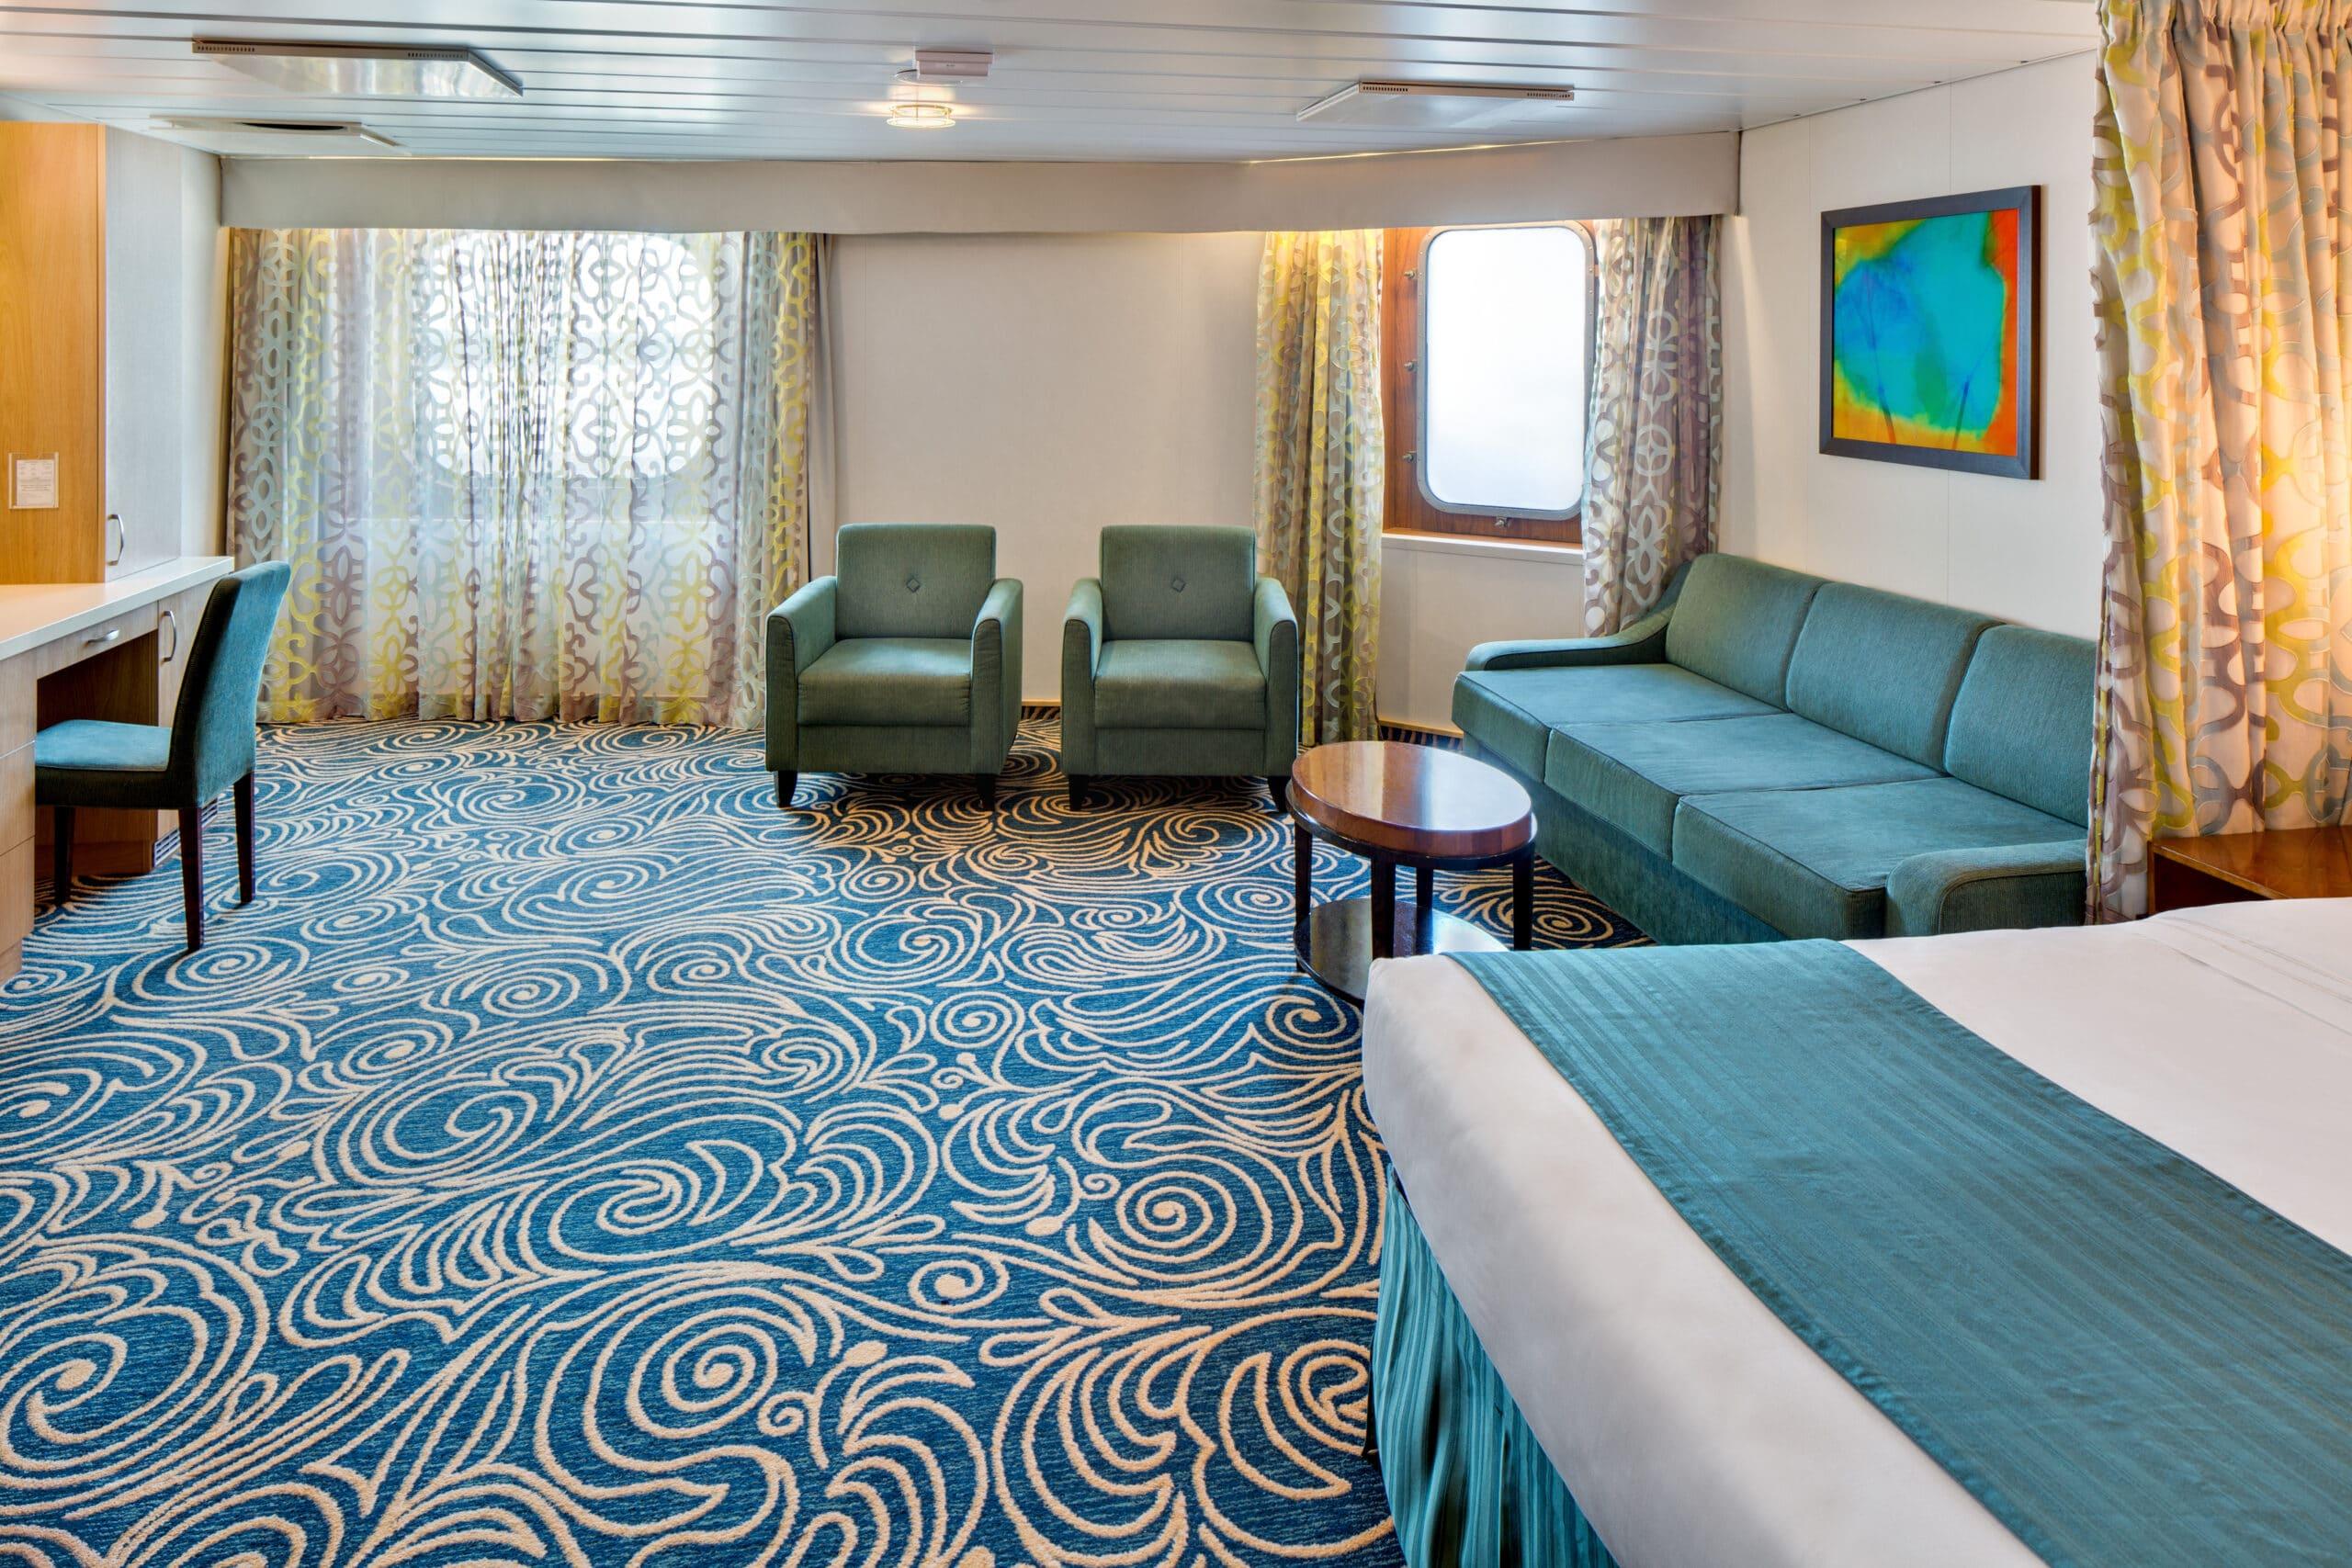 Royal-Caribbean-International-Rhapsody-of-the-Seas-schip-cruiseschip-categorie-VO-Ocean-Suite